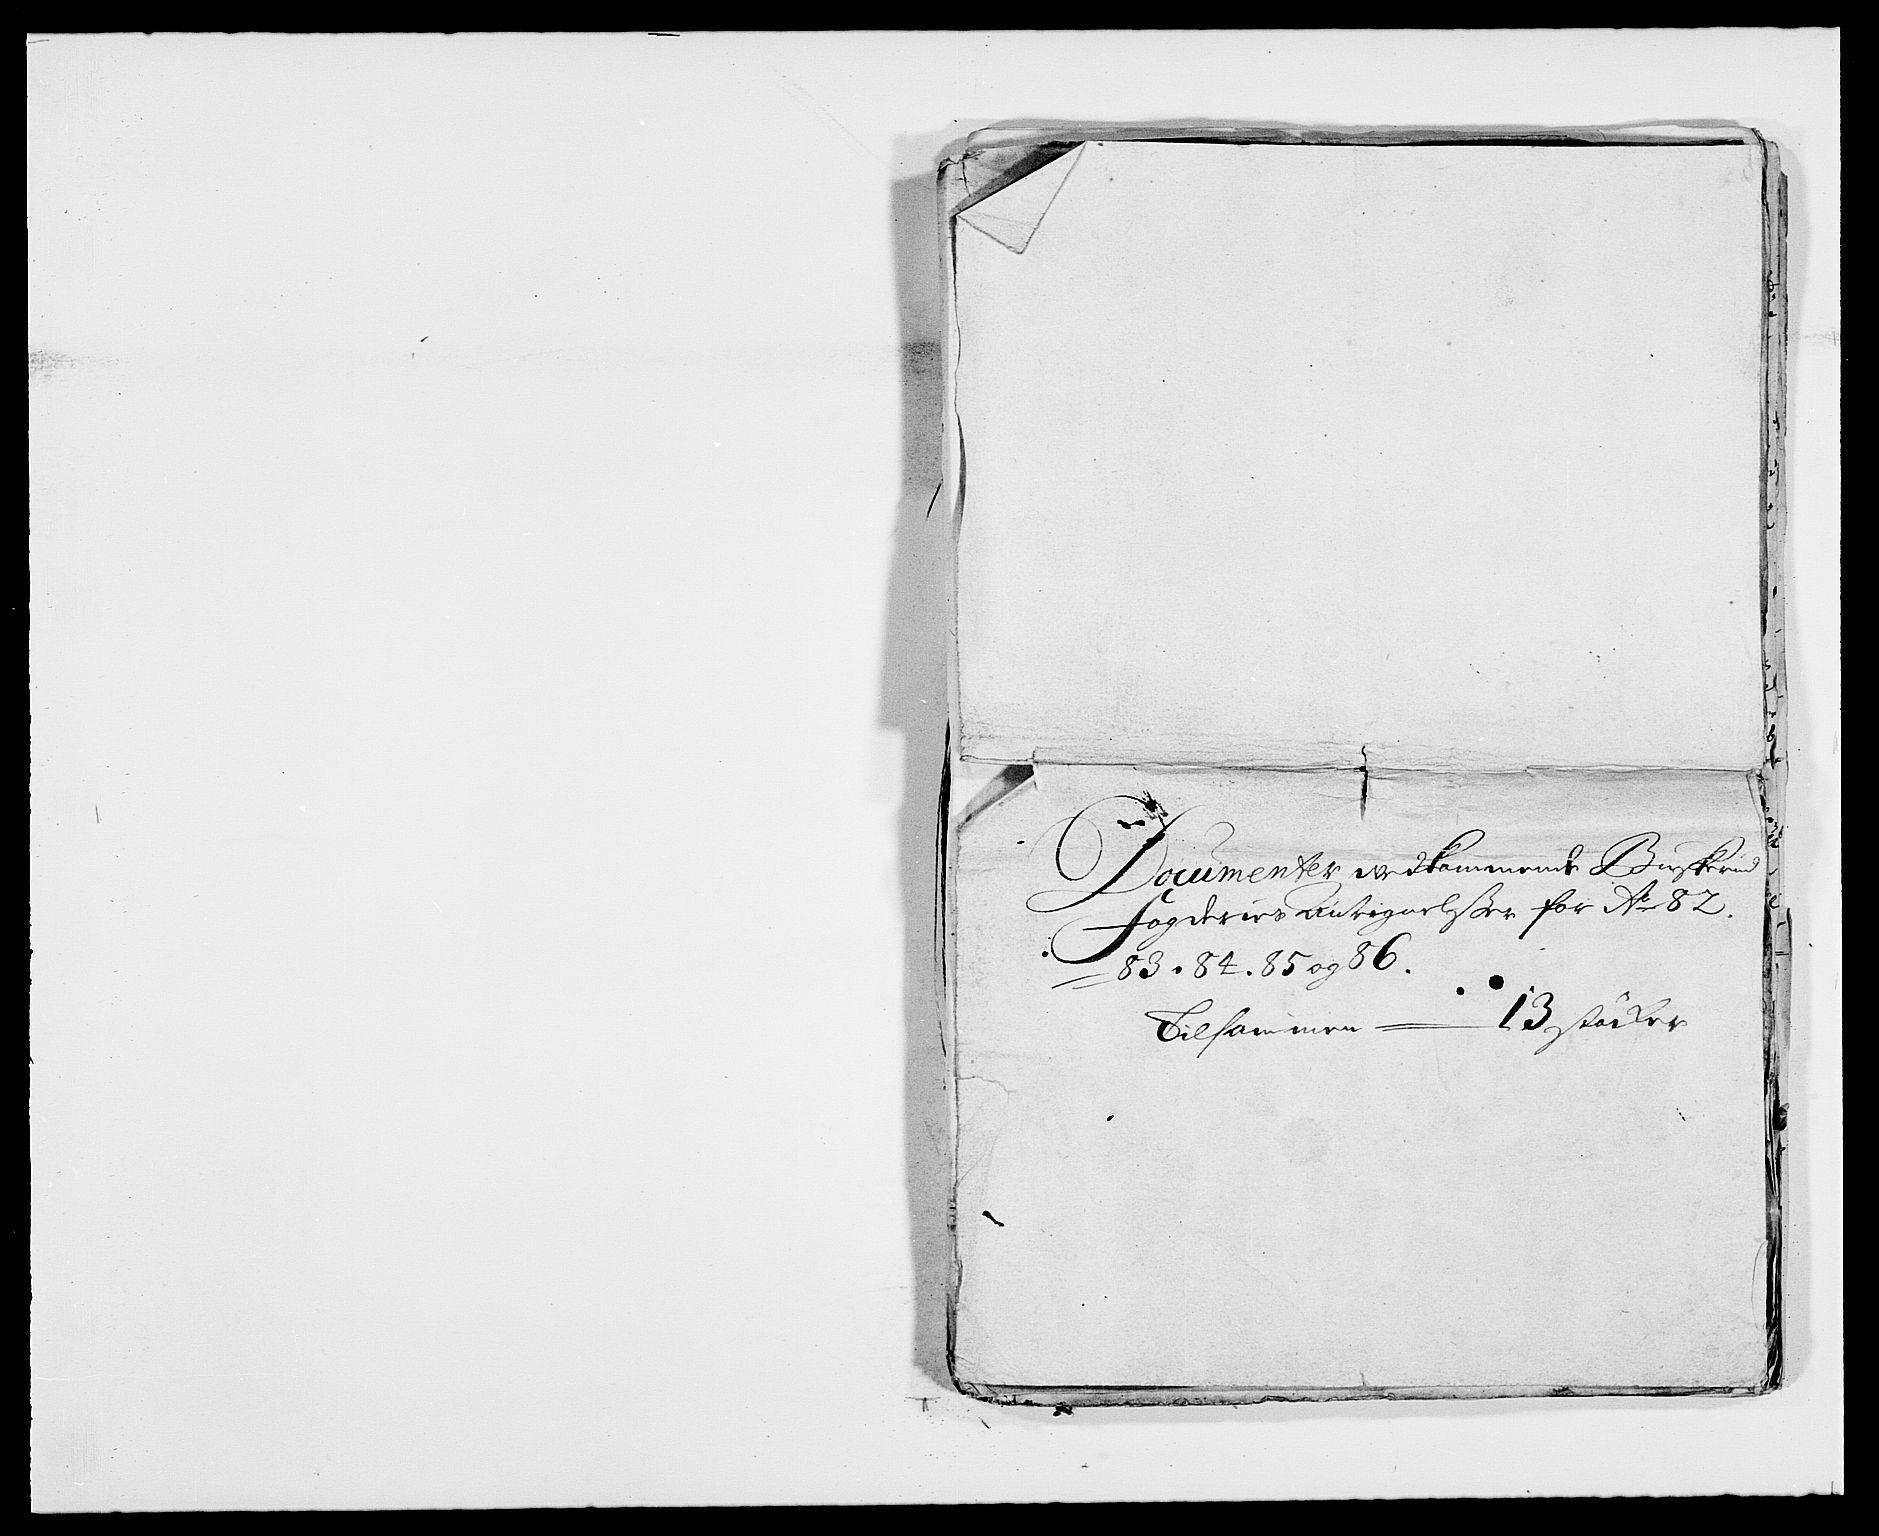 RA, Rentekammeret inntil 1814, Reviderte regnskaper, Fogderegnskap, R25/L1678: Fogderegnskap Buskerud, 1685-1686, s. 437